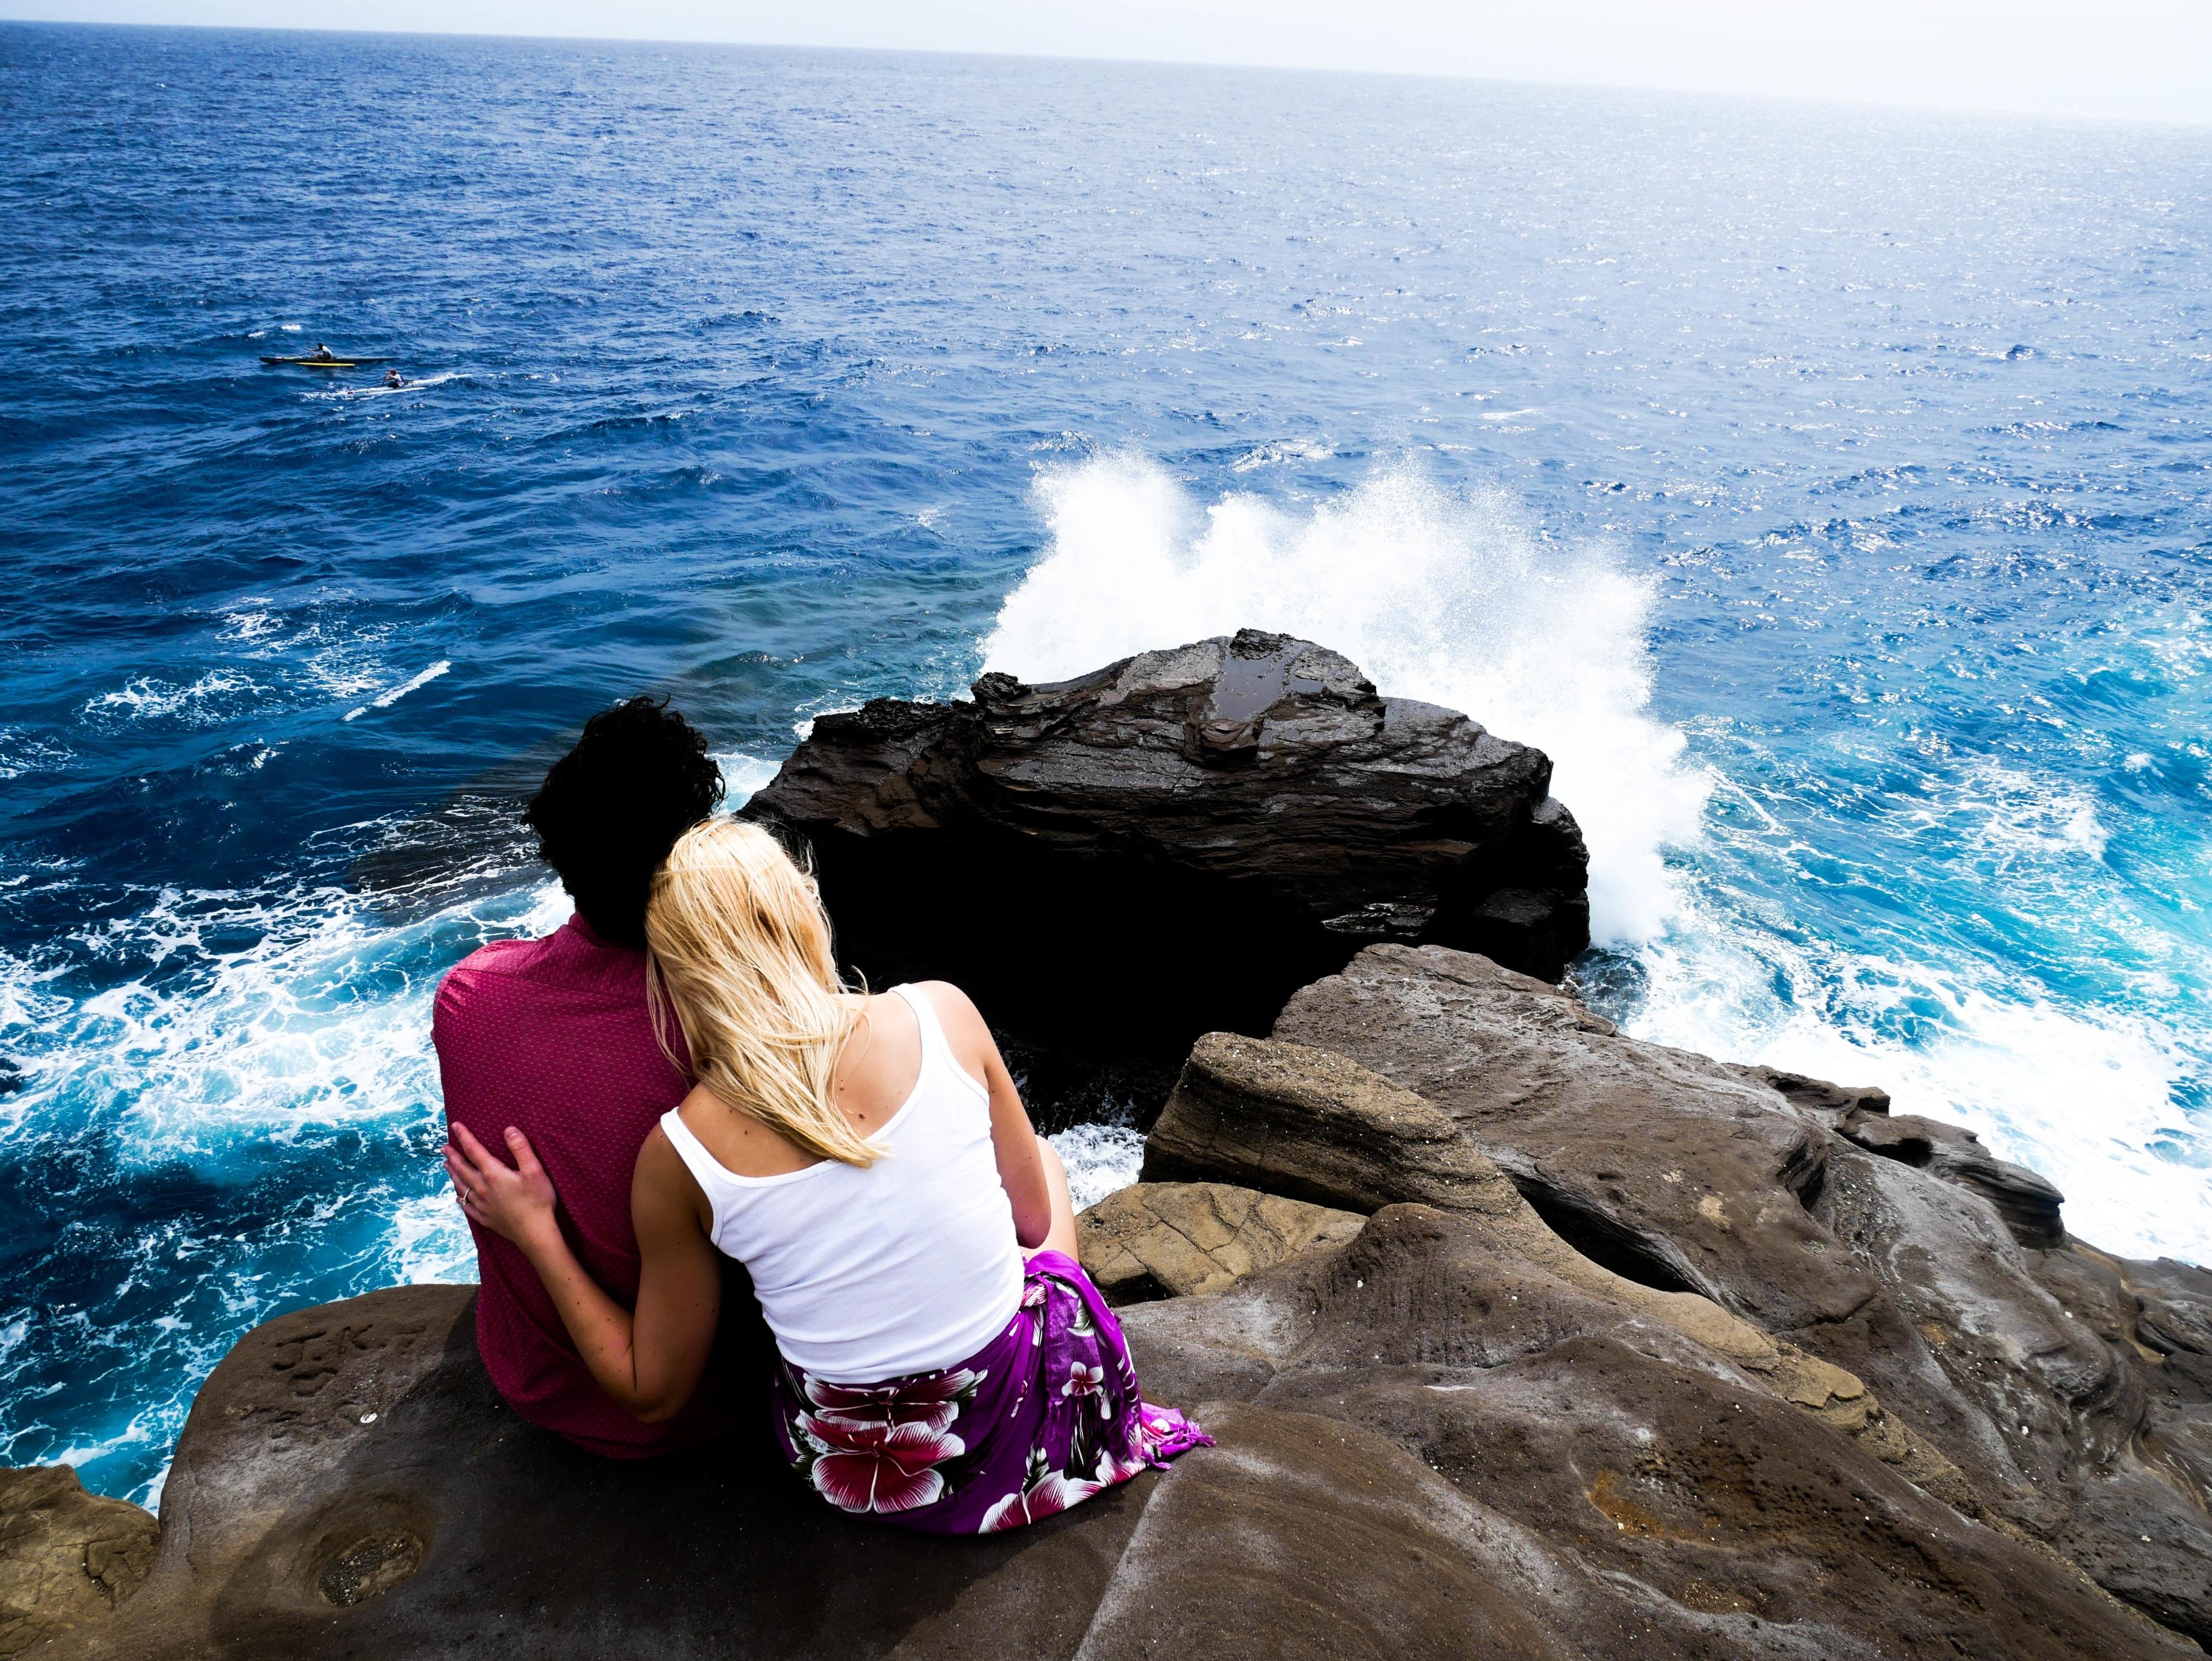 Portlock, Honolulu, Hawaii, United States of America